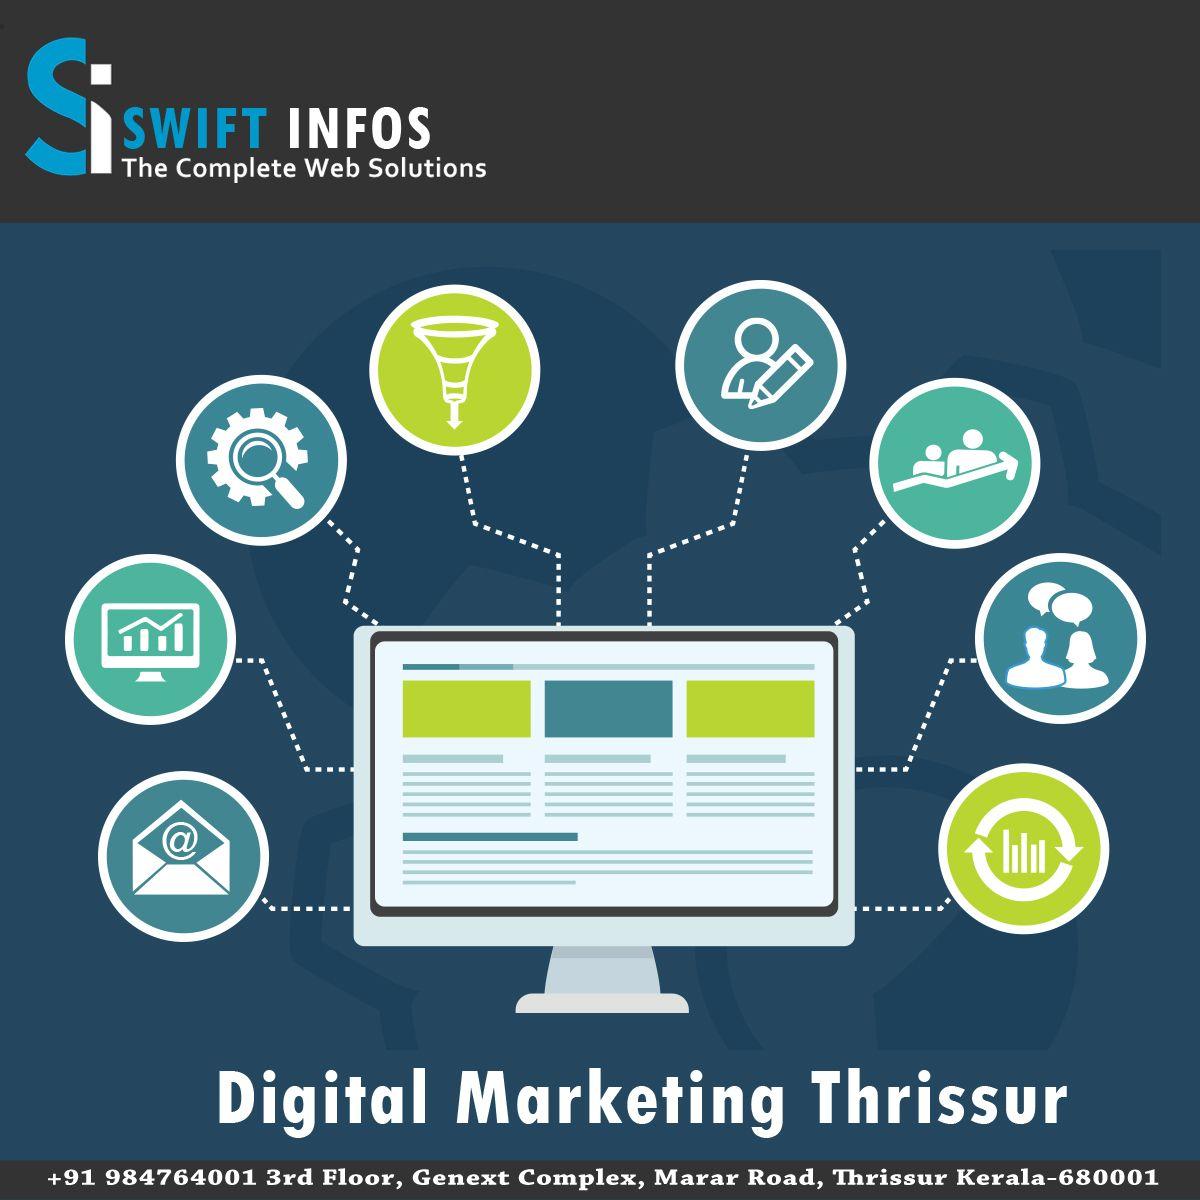 Digital Marketing Thrissur Digital Marketing Website Development Company Social Media Optimization